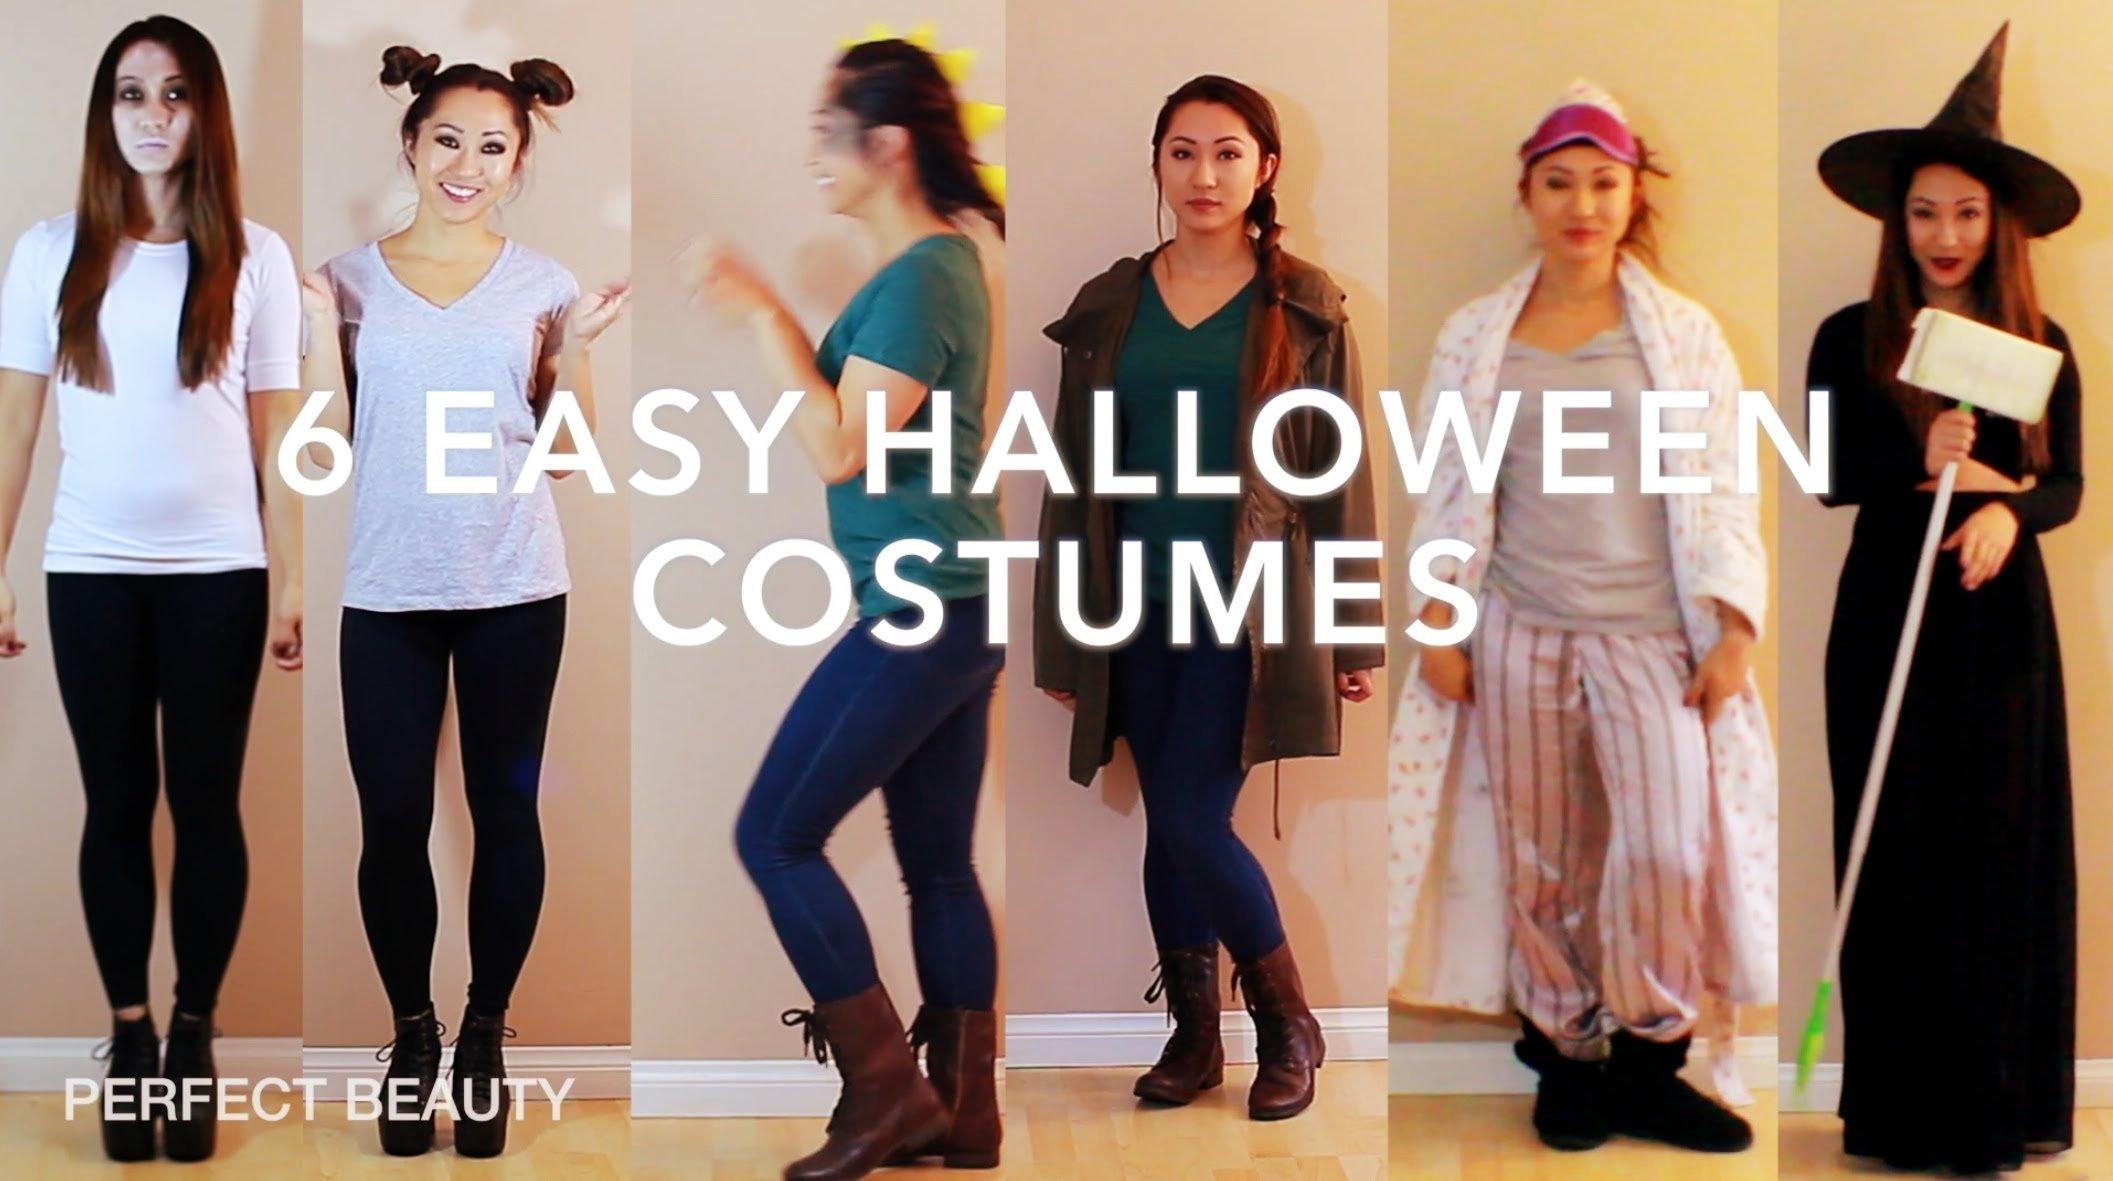 last minute! diy halloween costume ideas! perfect beauty - youtube